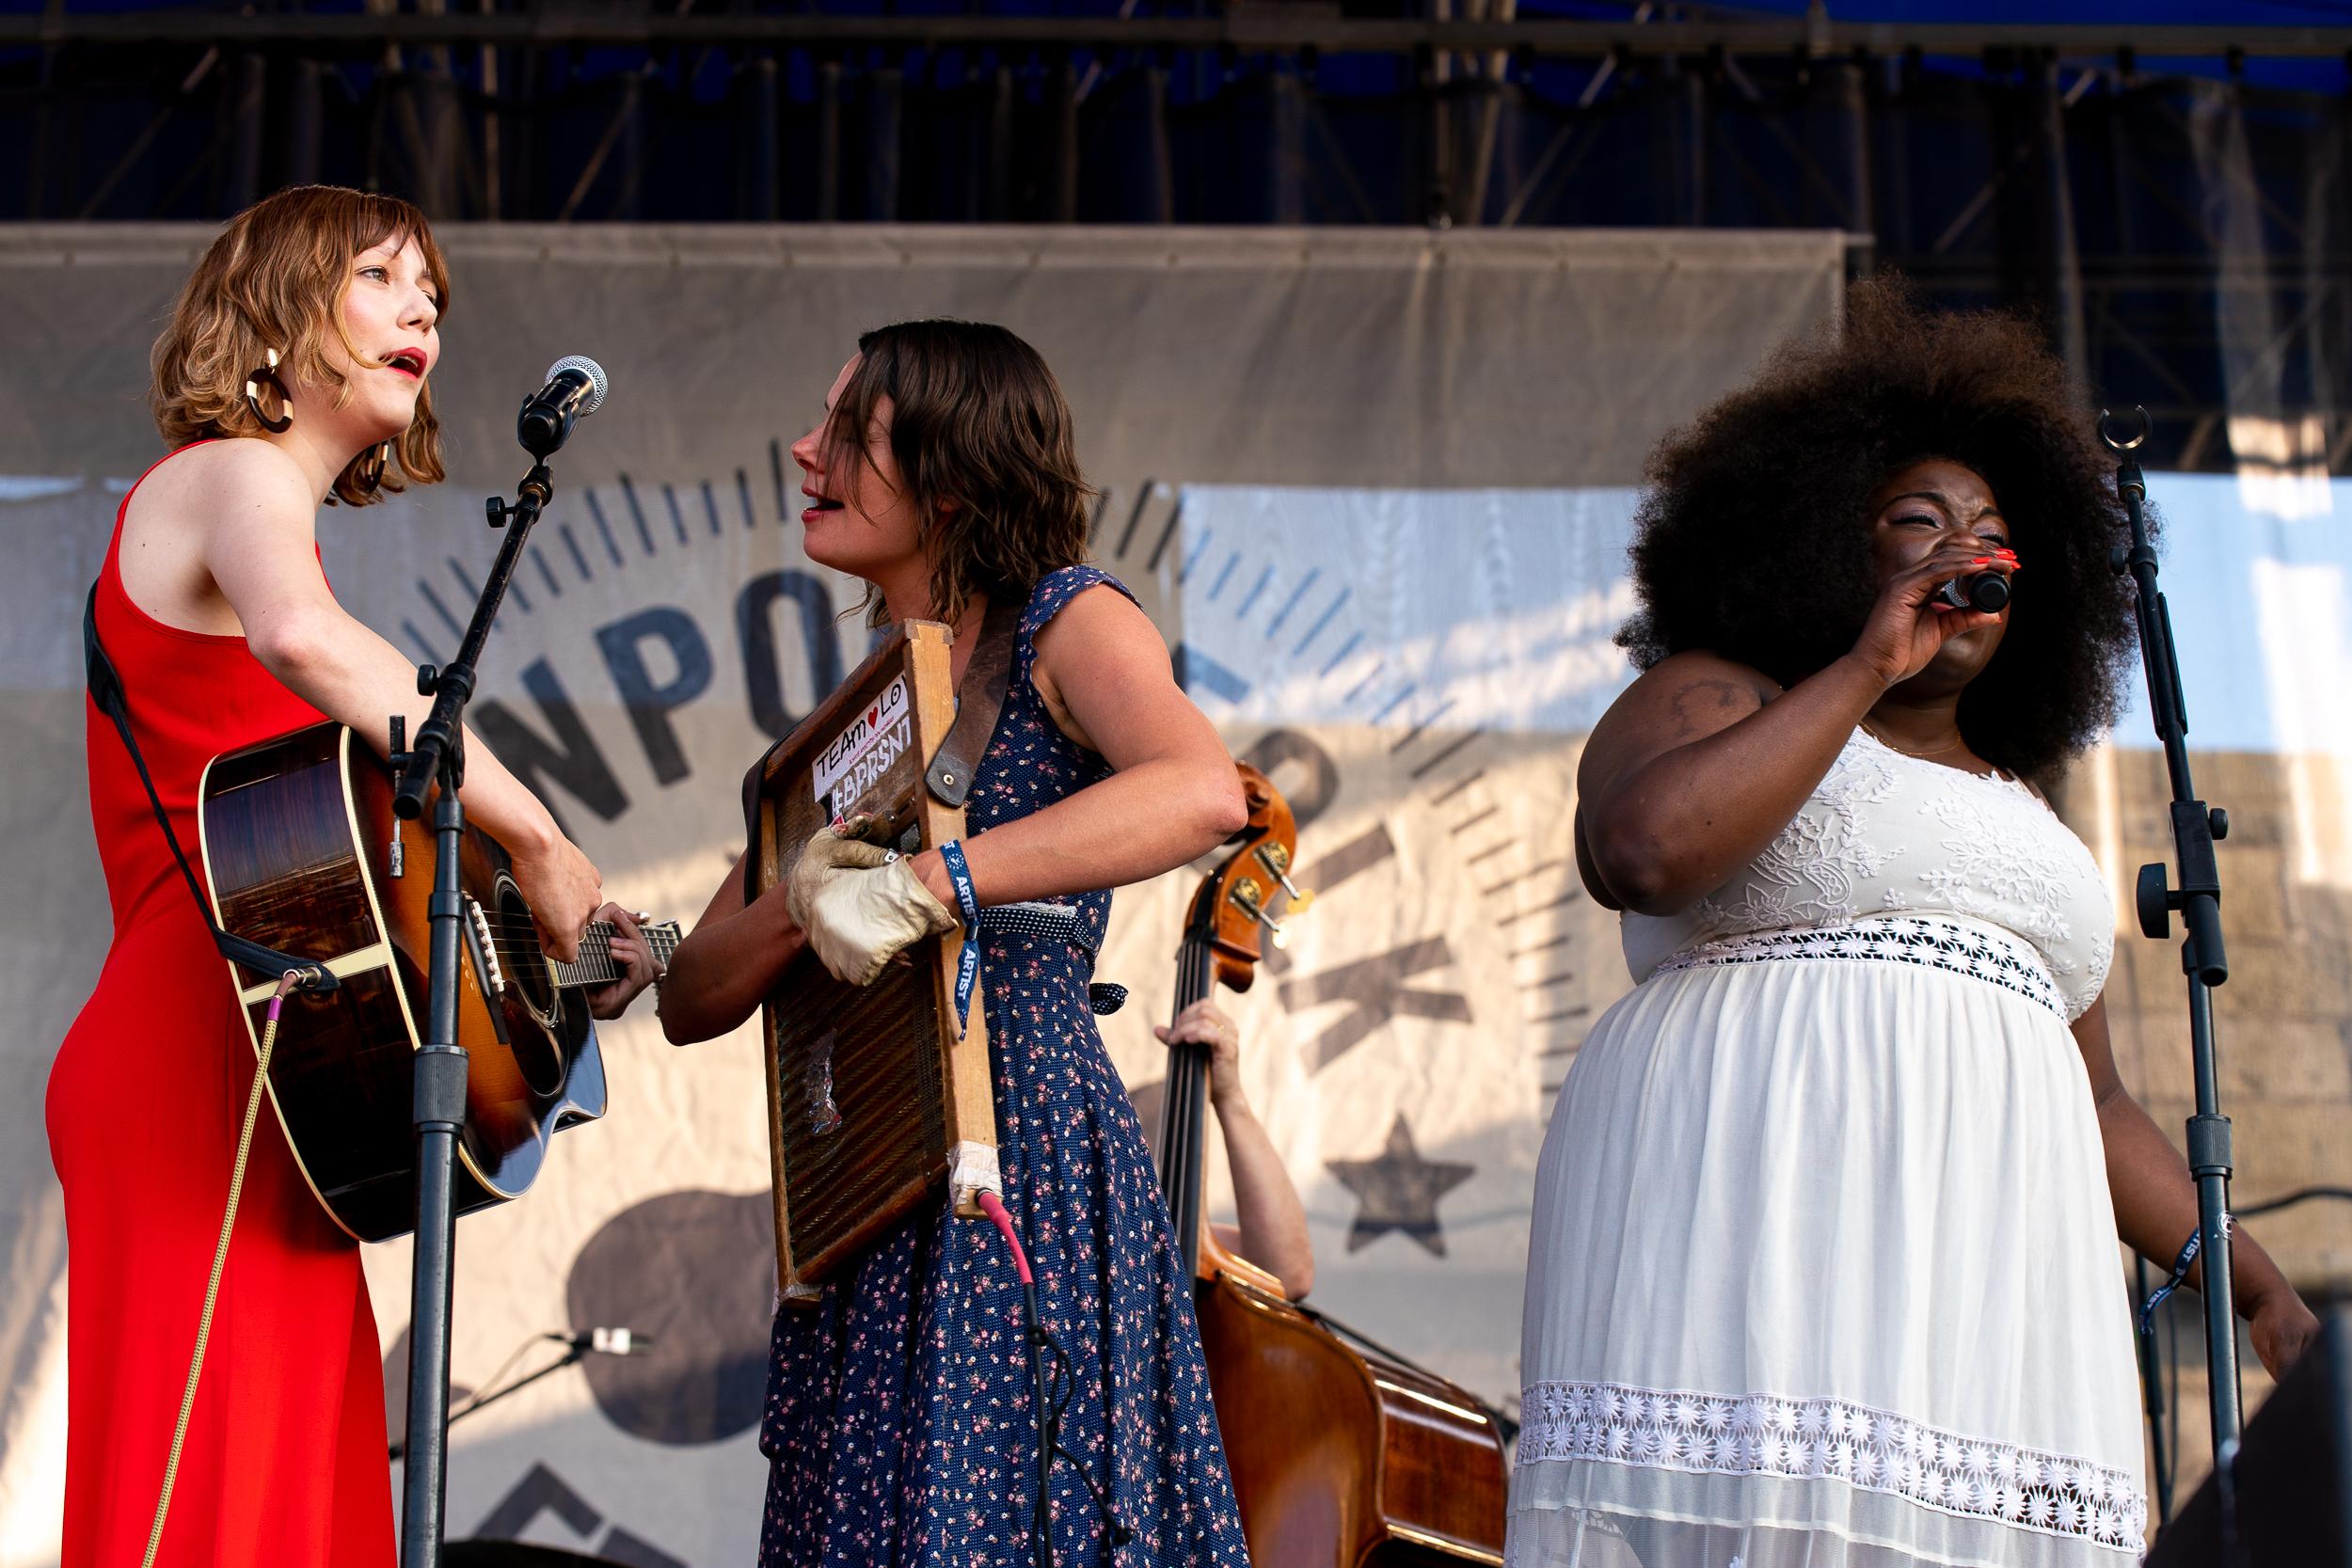 Molly Tuttle, Bonnie Paine, and Yola at Newport Folk Festival (Photo by Mauricio Castro)